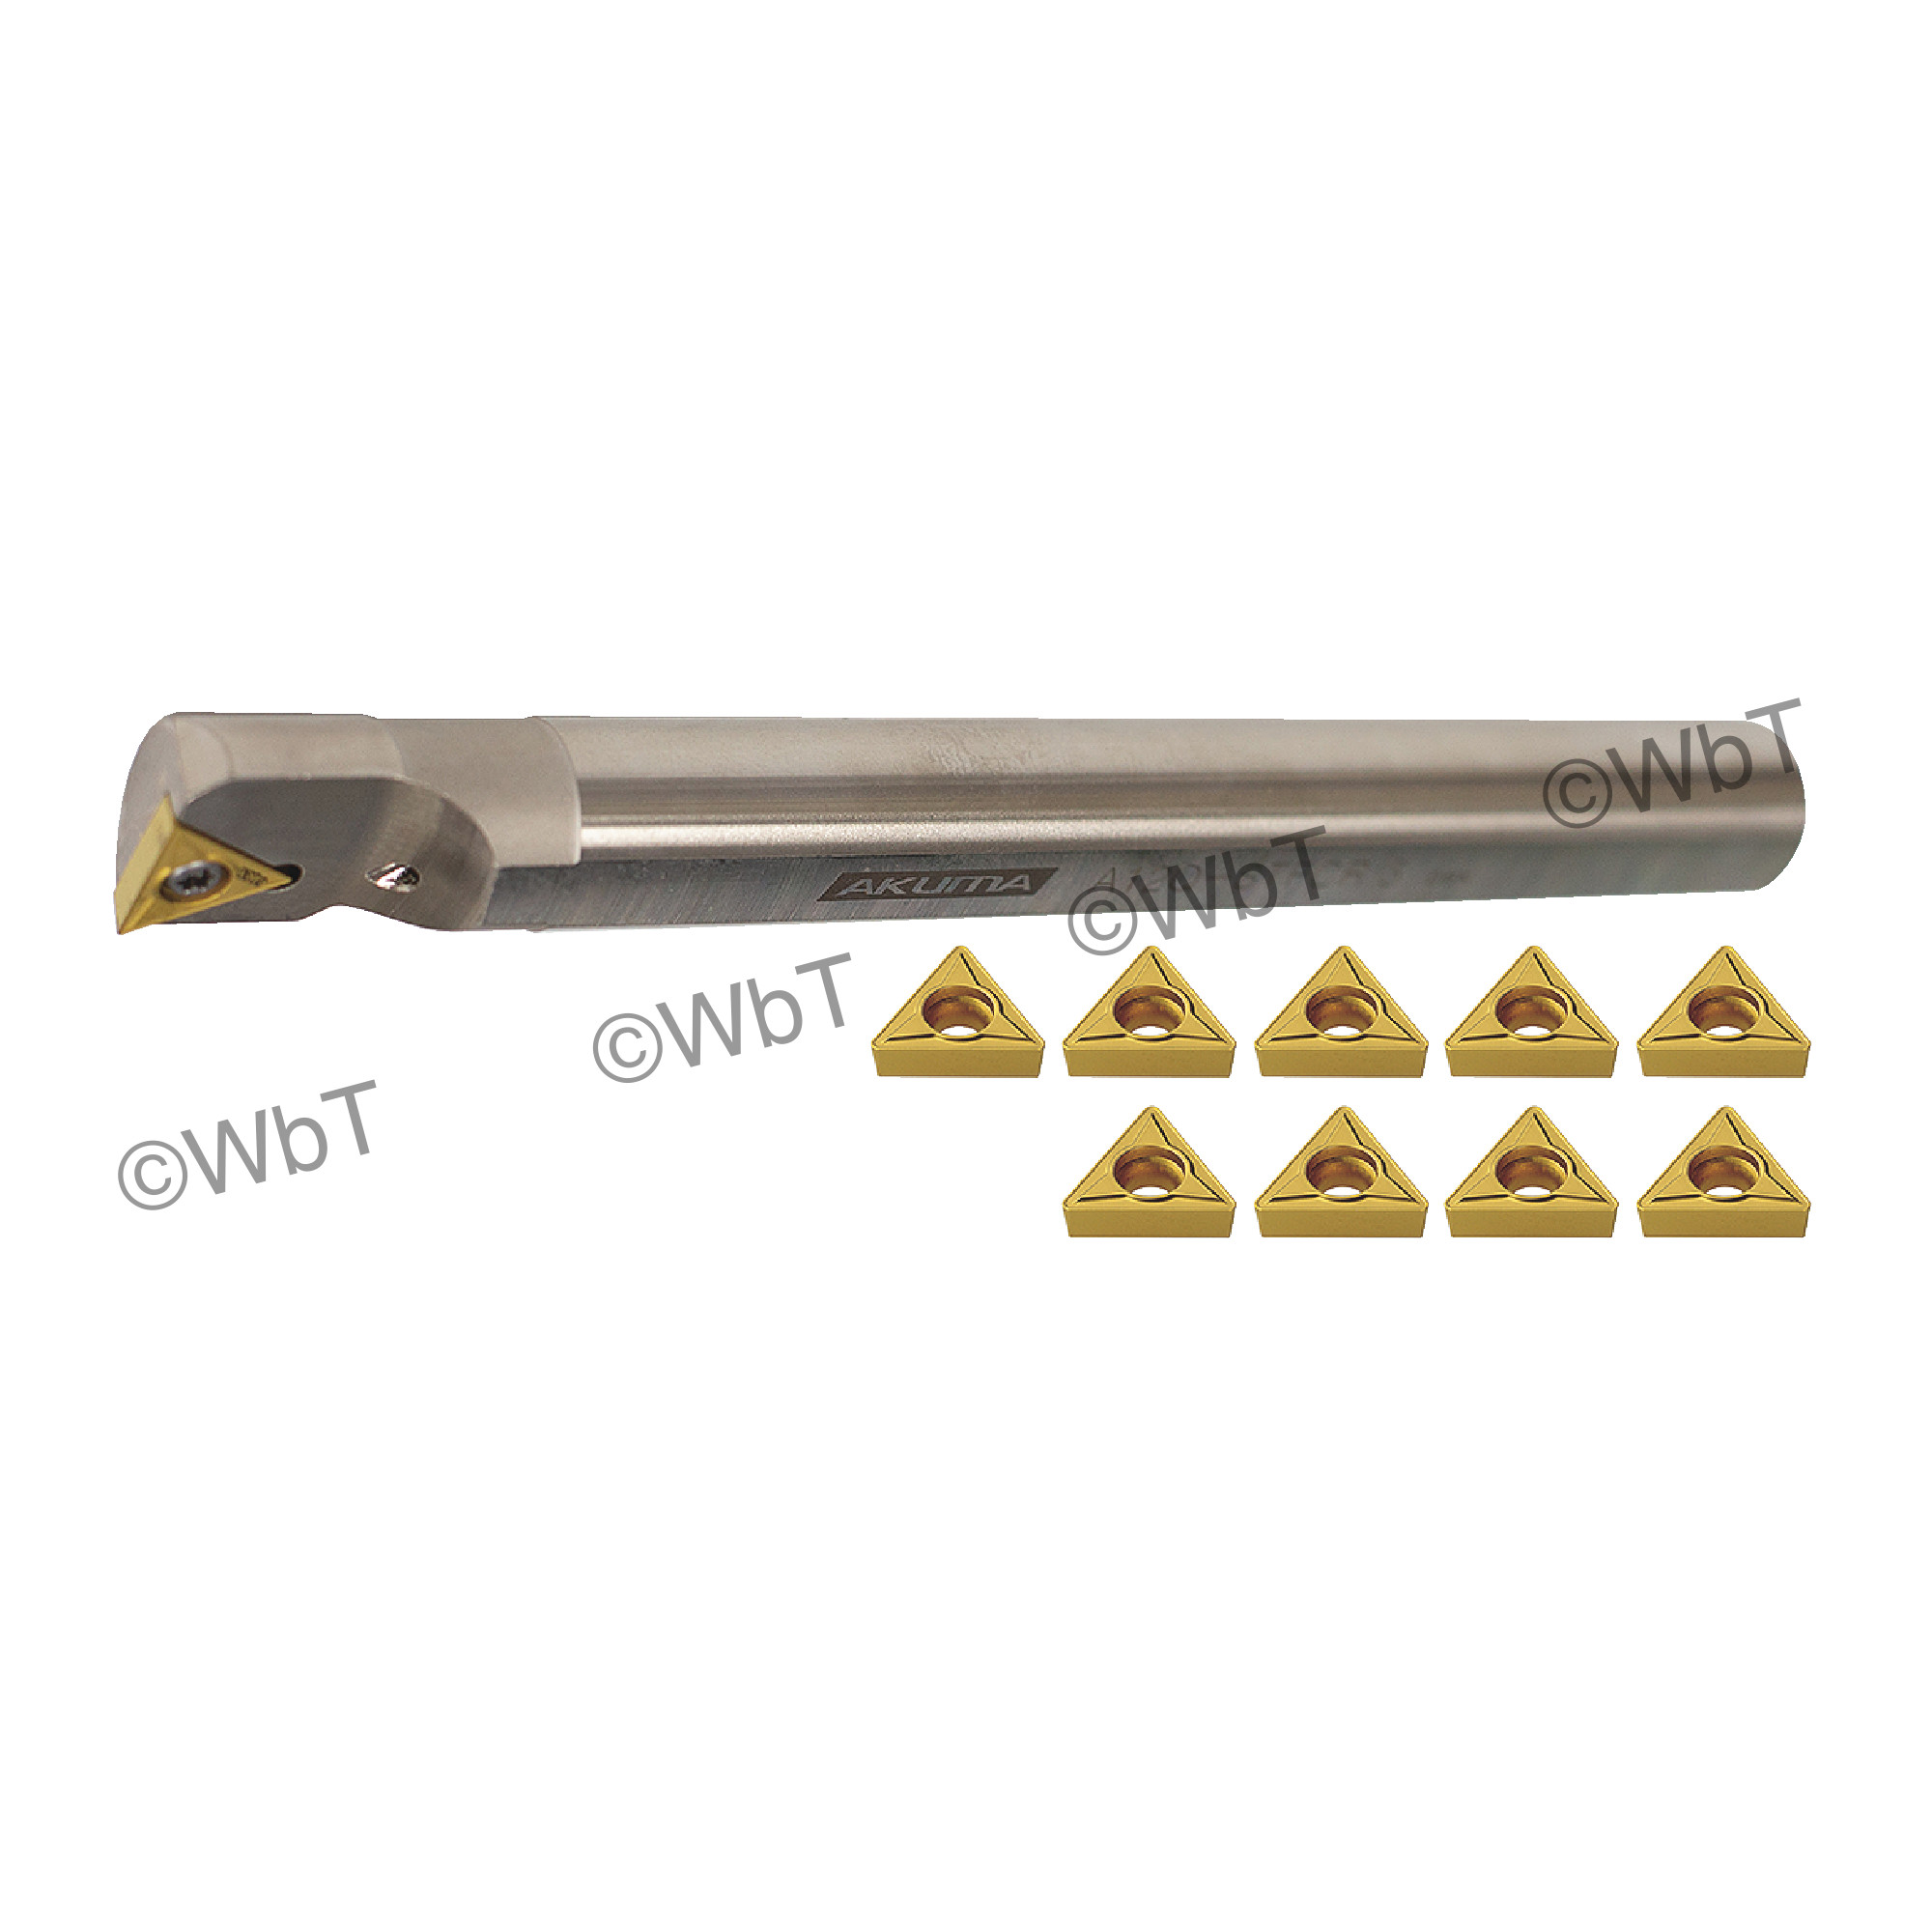 "AKUMA - 3/4"" Boring Bar Set with (1) A12Q-STFCR-3 (3/4"") & (10) TCMT3(2.5)1-MP1 CT25M Coated Inserts / Coolant Thru / Ri"